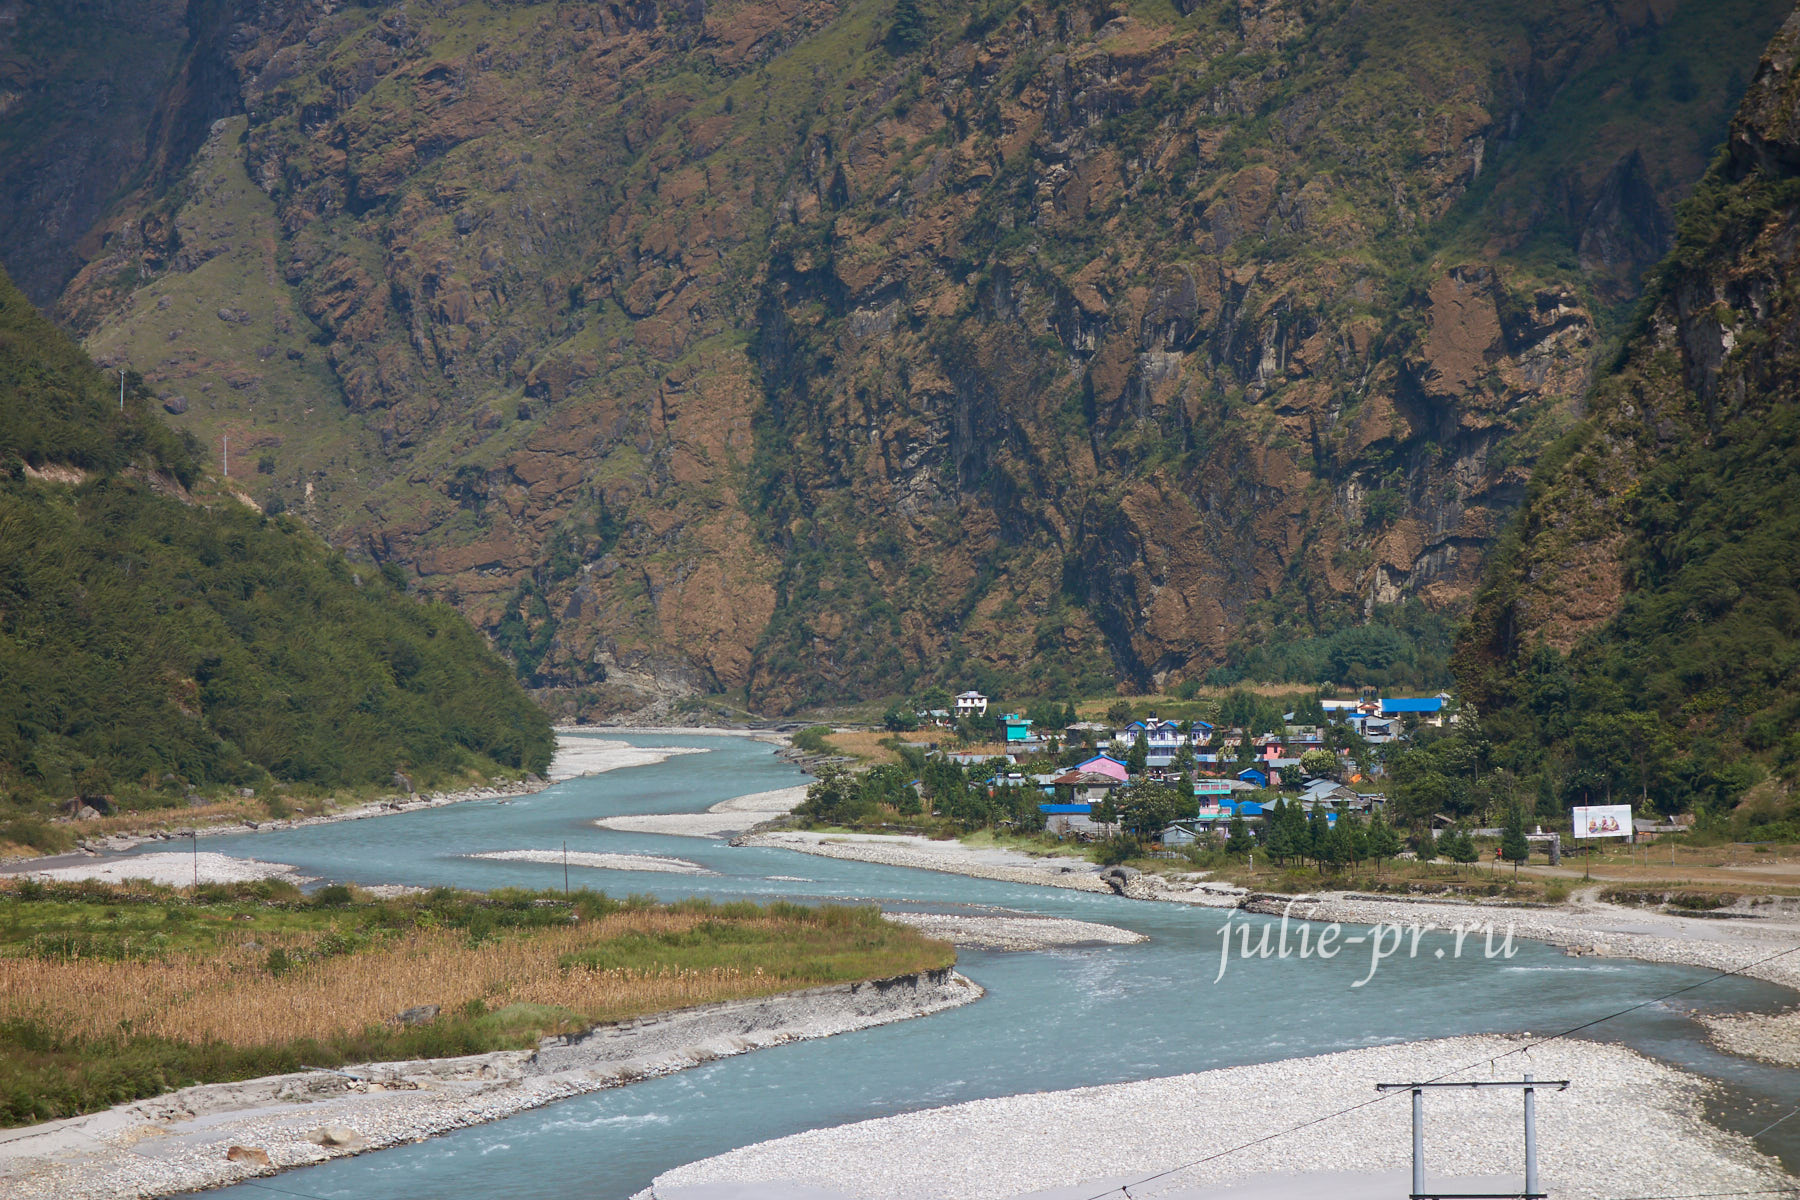 Непал, Трек вокруг Аннапурны, Деревня Тал